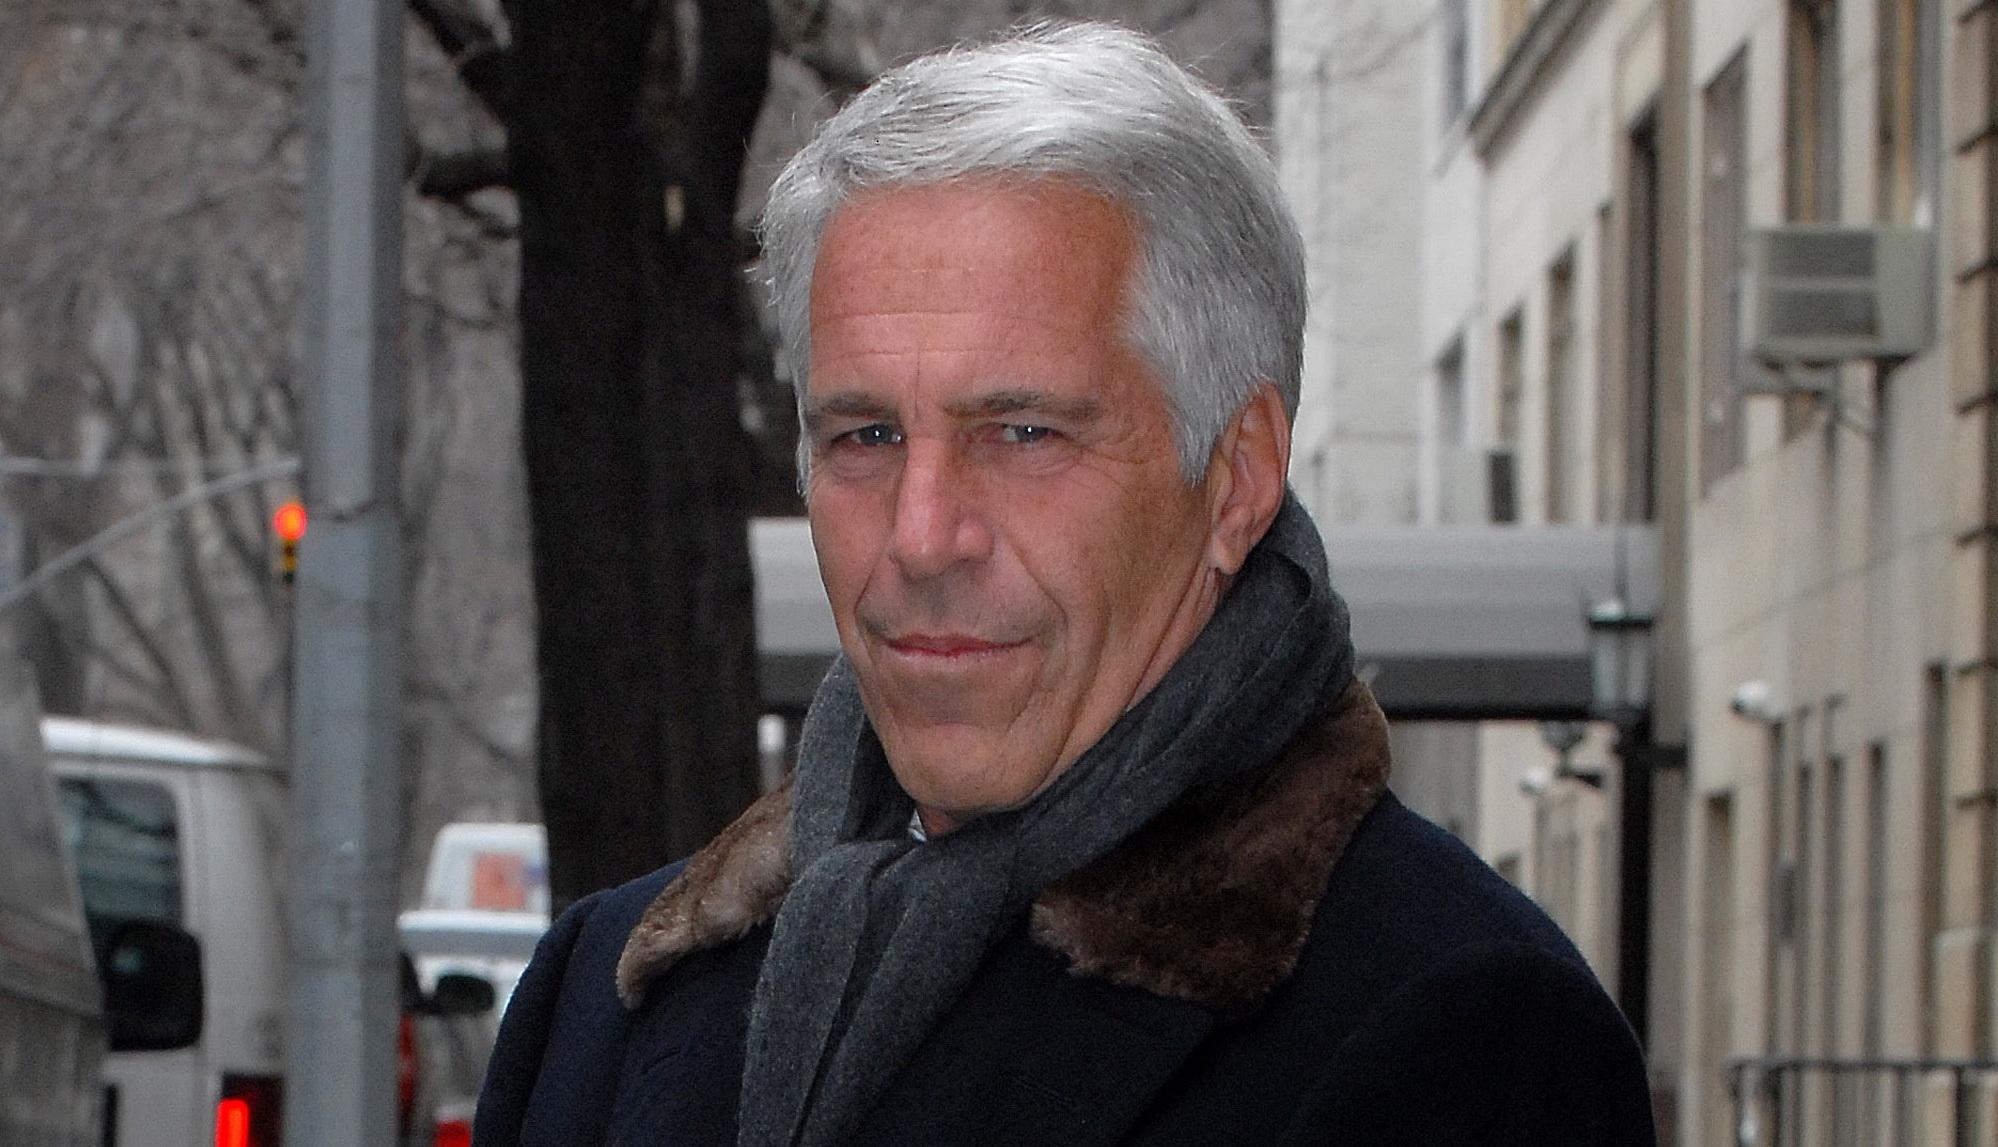 Jeffry Epstein